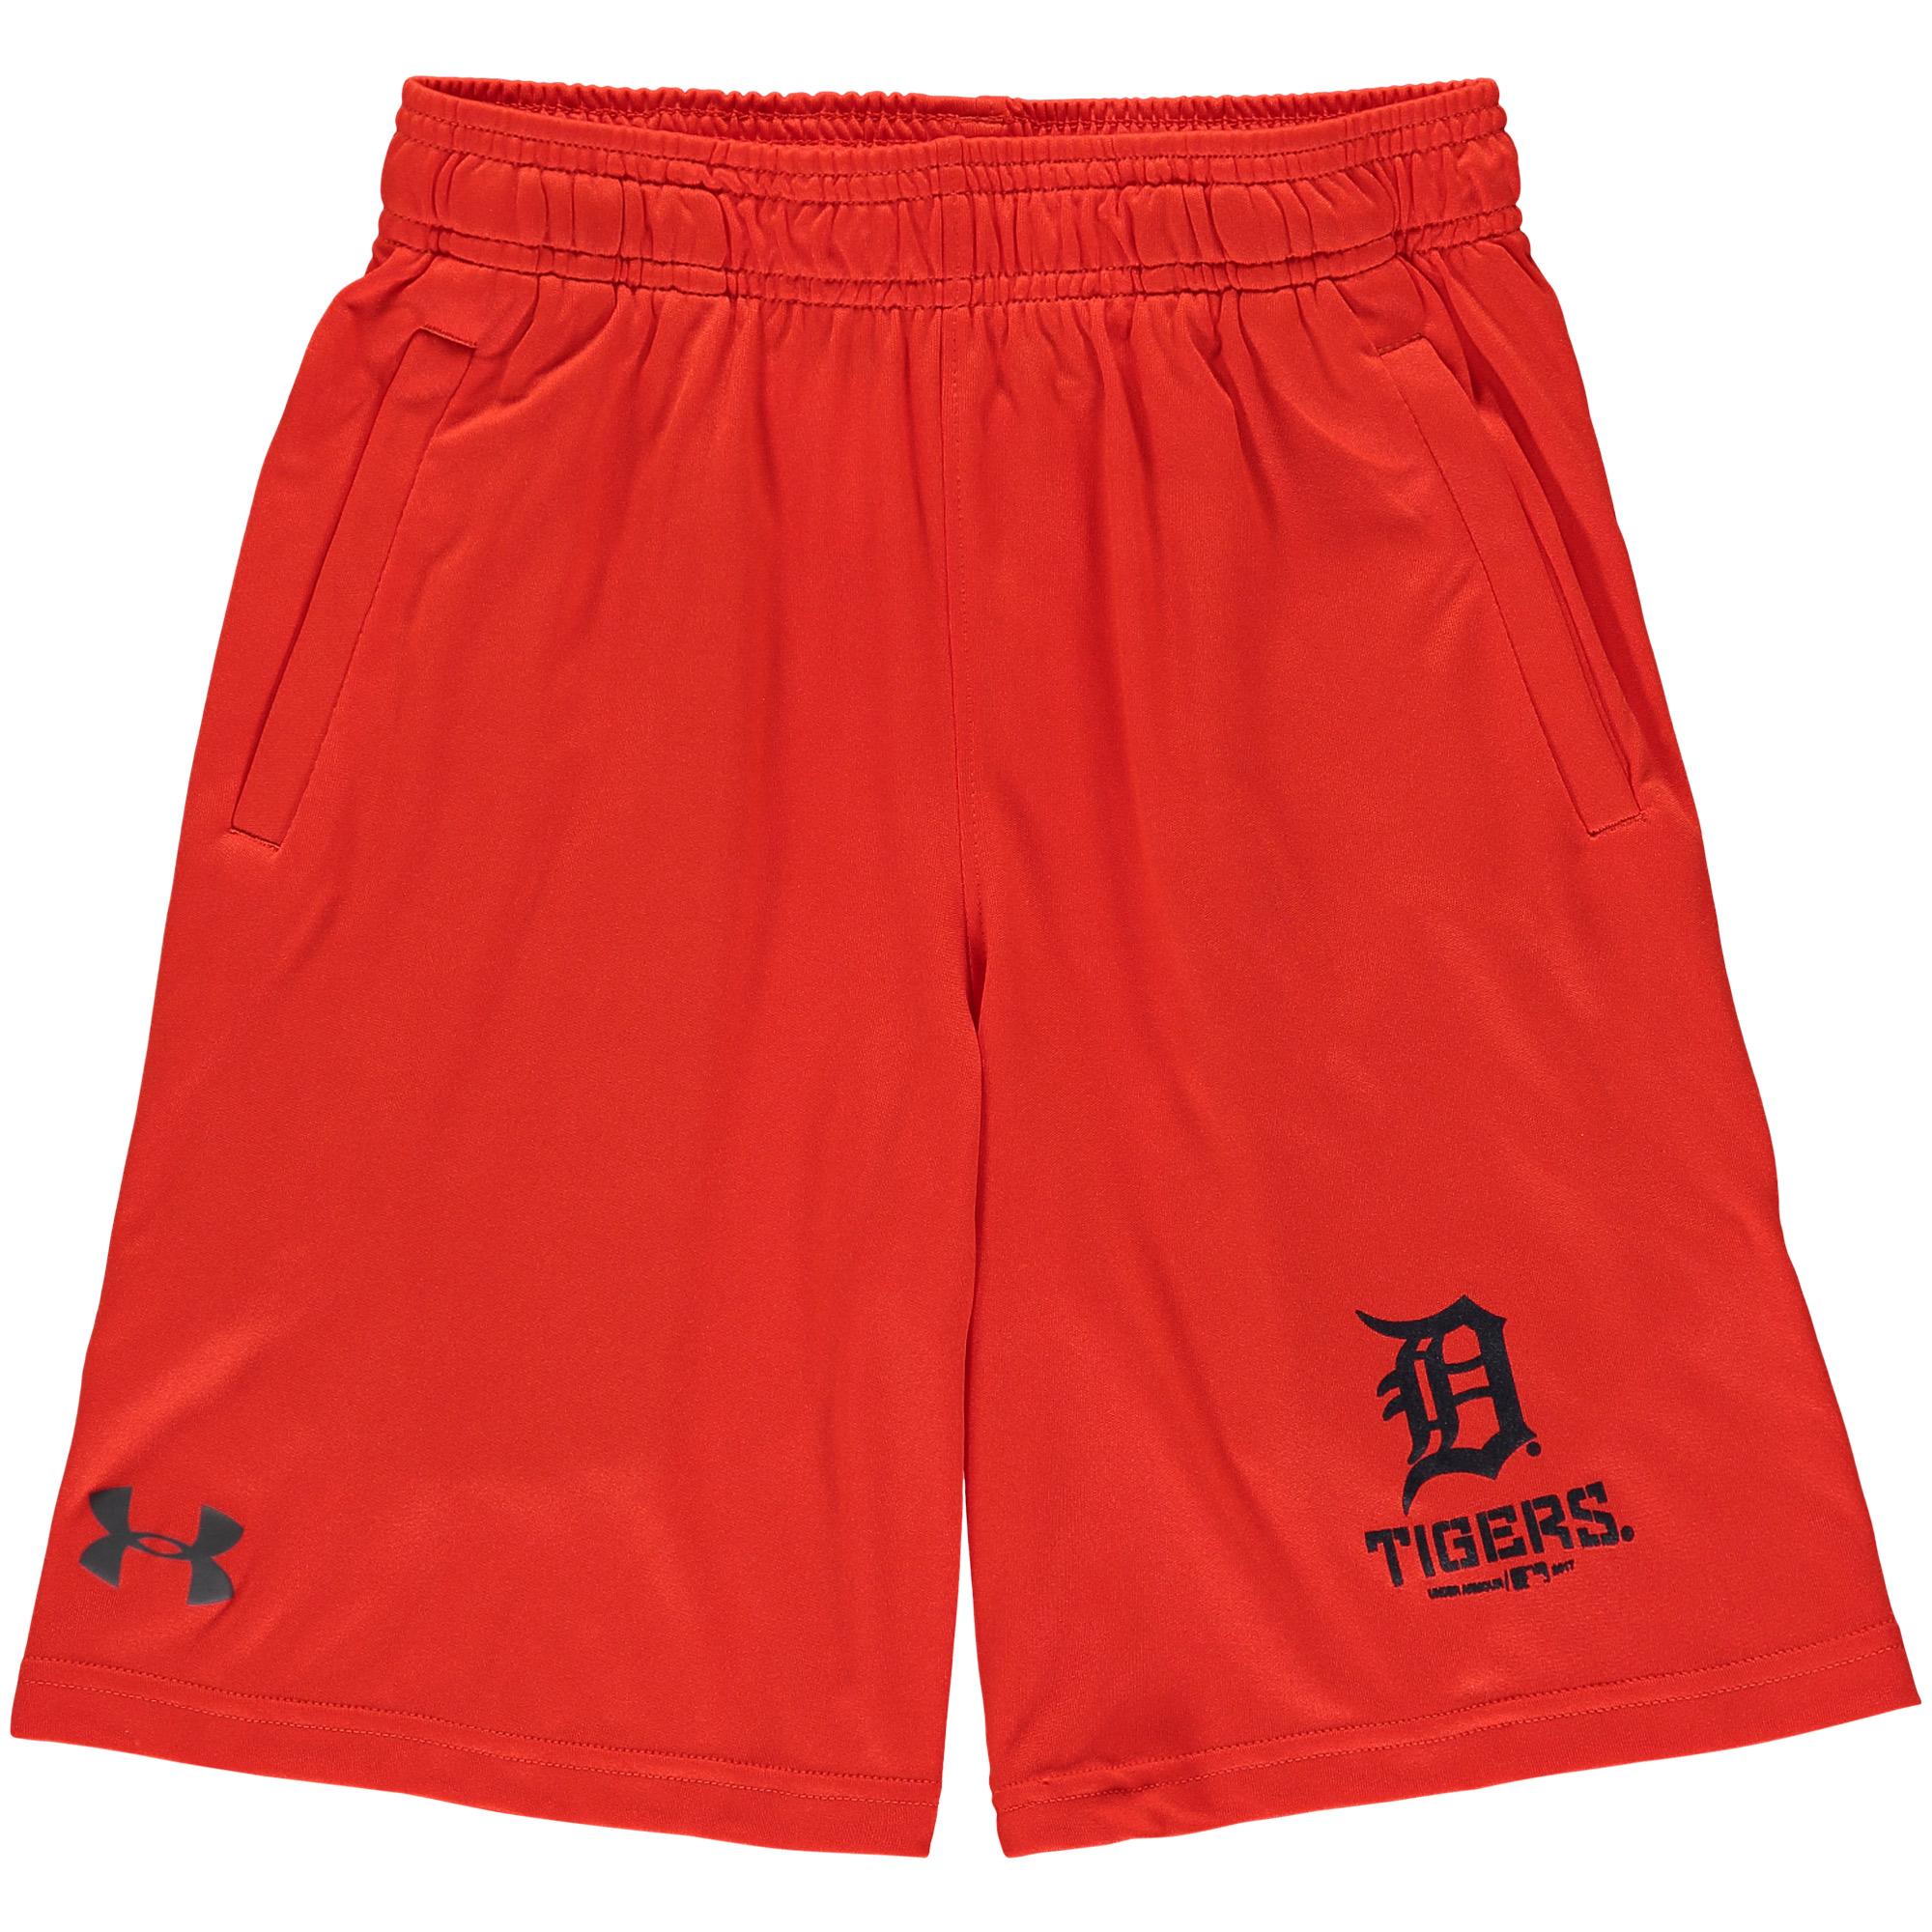 Detroit Tigers Under Armour Youth Intimidator Performance Shorts - Orange